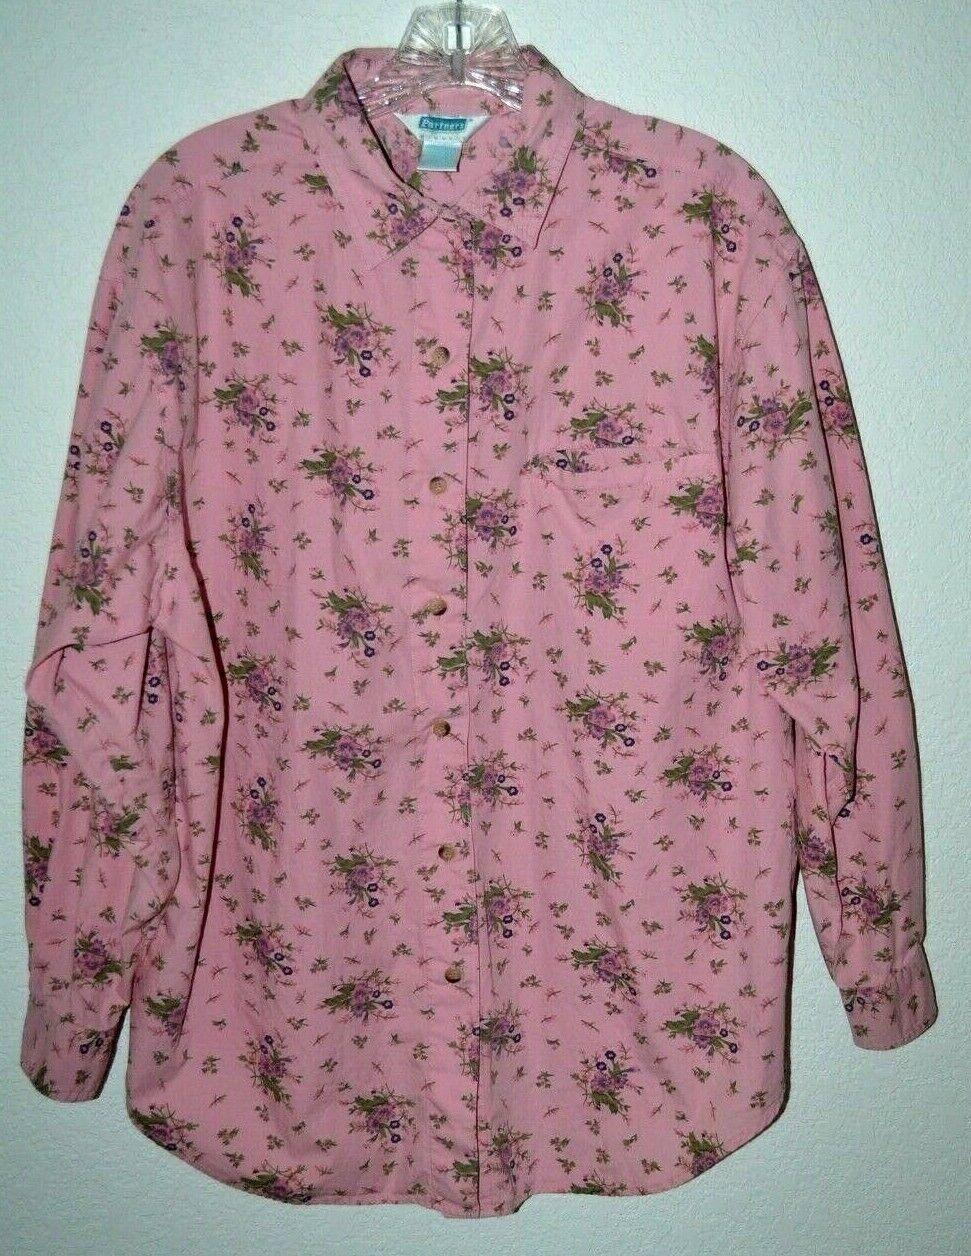 Partners Mervyns Women/'s Sz M Vintage 80/'s Mustard Blouse Top Shirt Smock